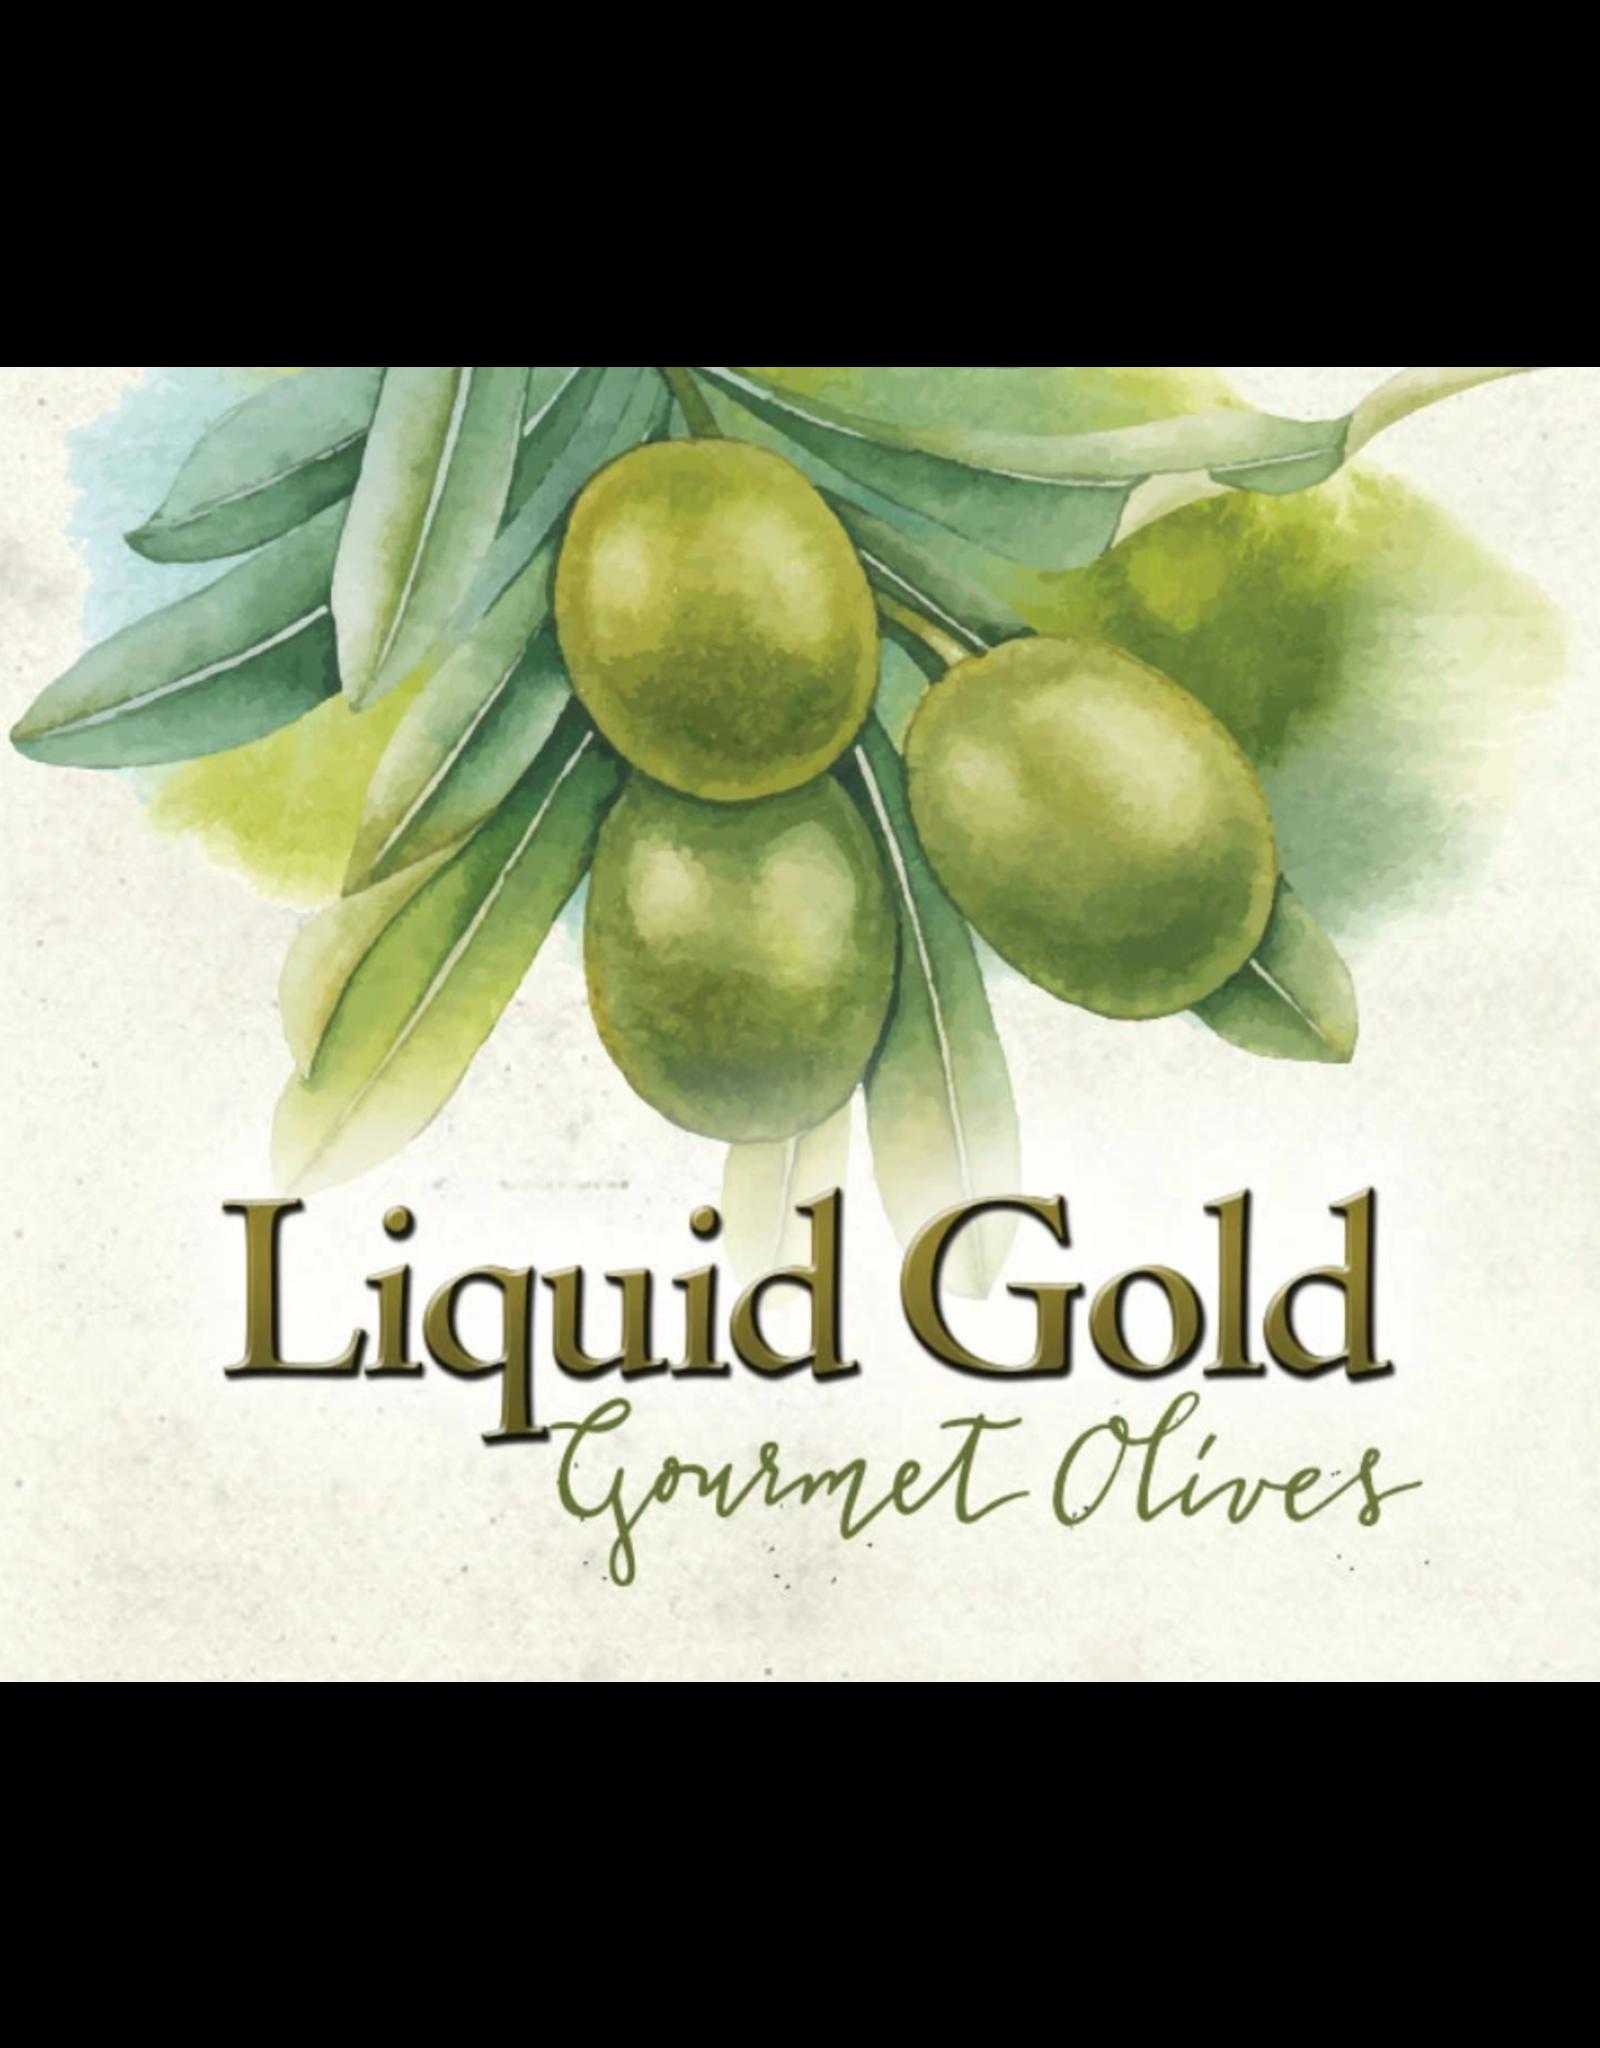 Liquid Gold Olive Oils & Vinegars Inc Liquid Gold, Almond Stuffed Olives